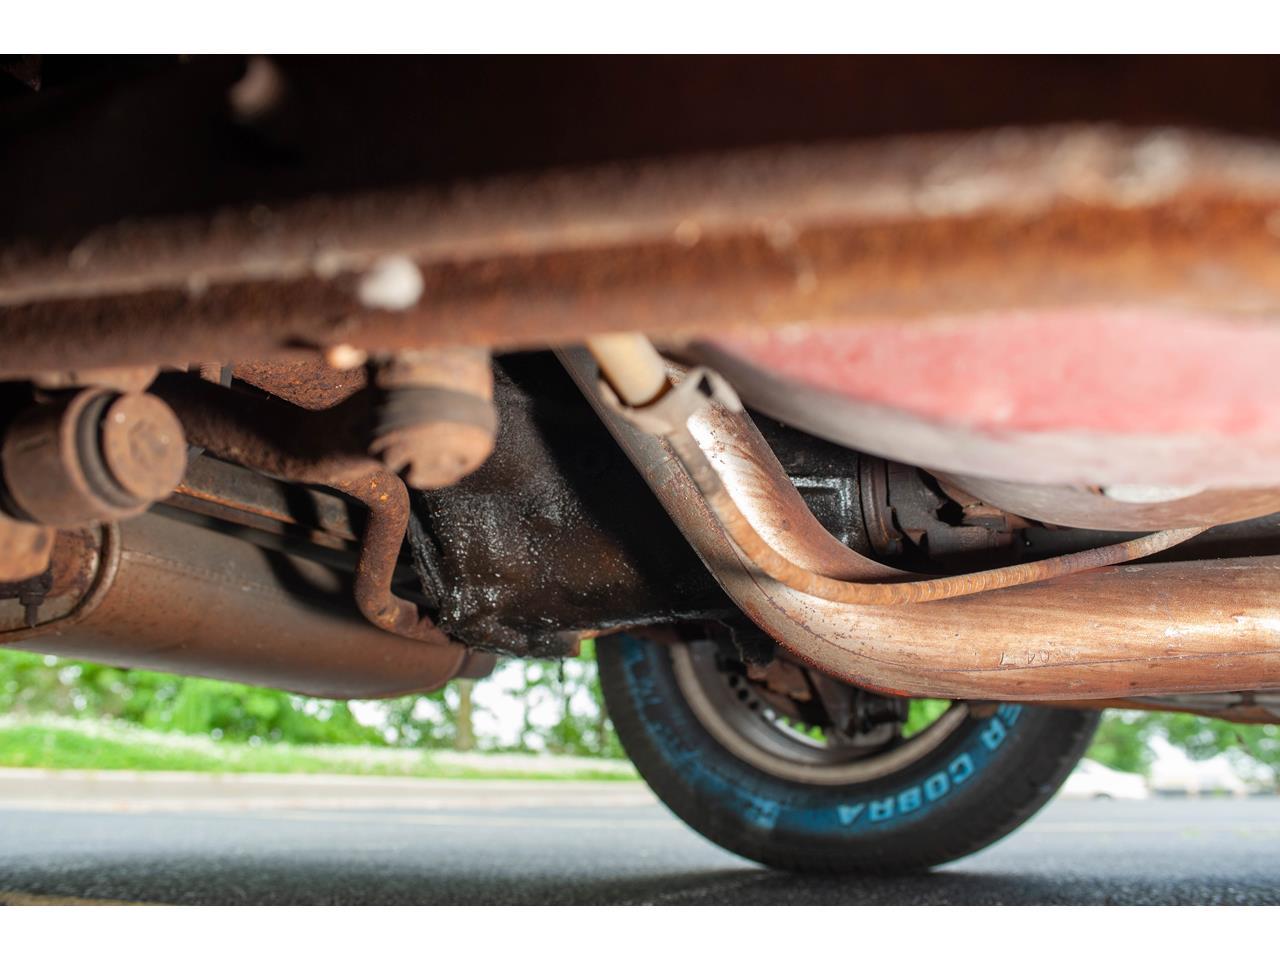 Large Picture of '84 Camaro located in Illinois - QB9Y